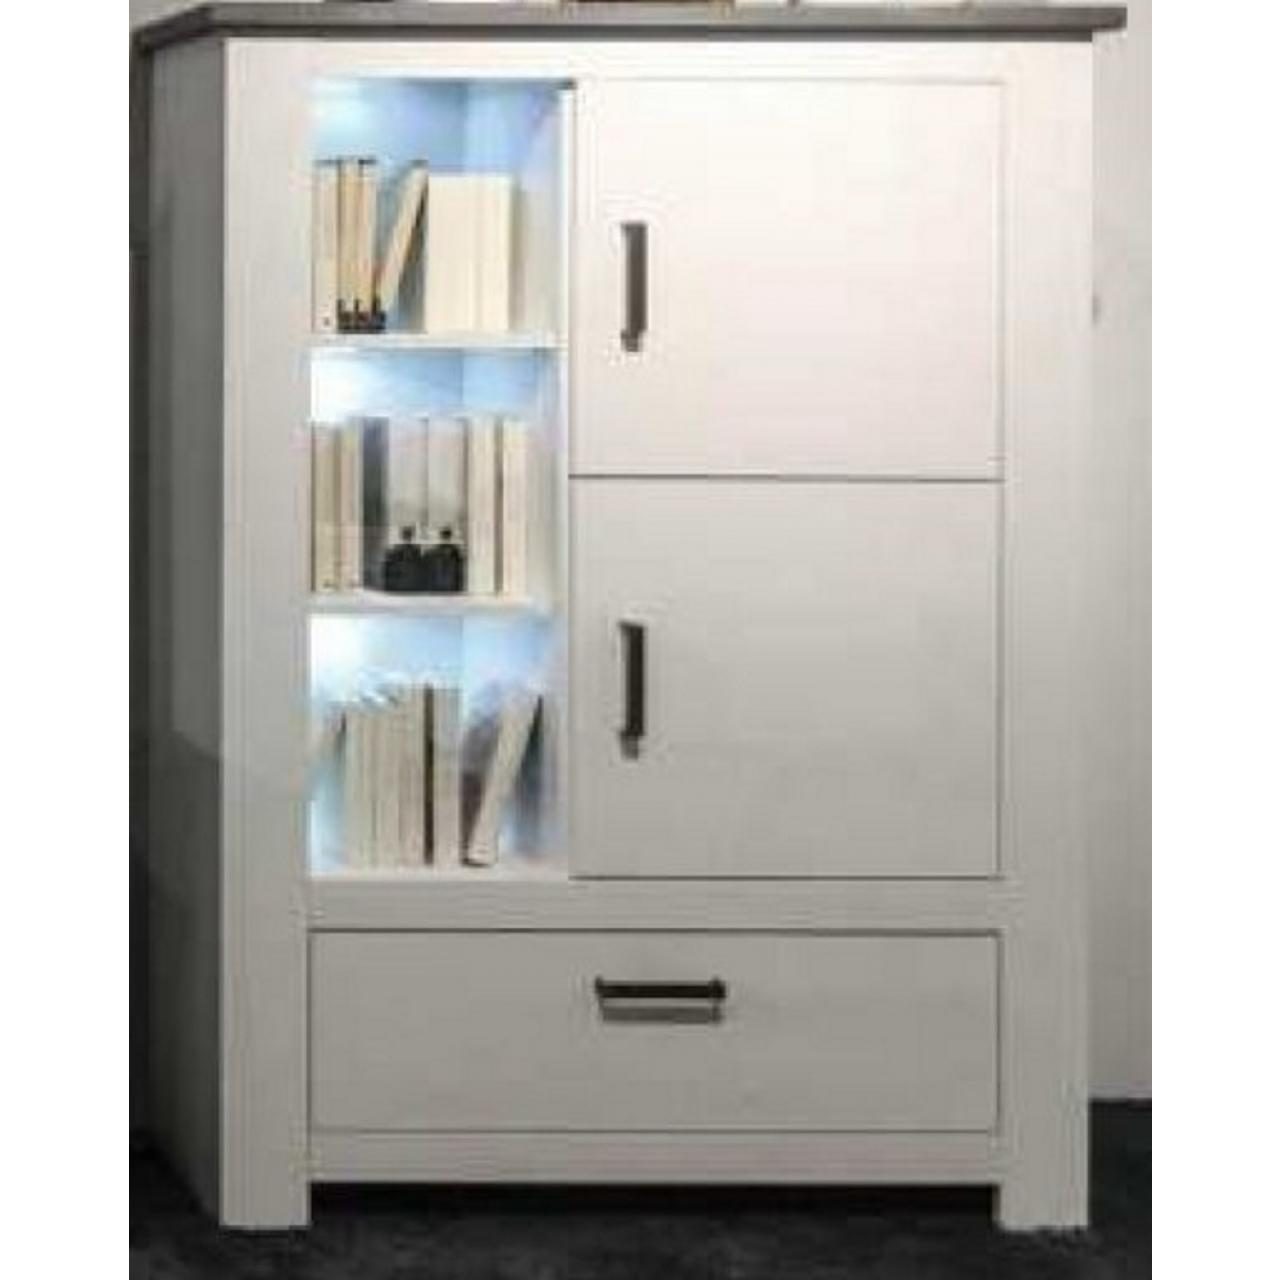 tv lowboard aus paulowniaholz landhausstil wei m bel j hnichen gmbh. Black Bedroom Furniture Sets. Home Design Ideas